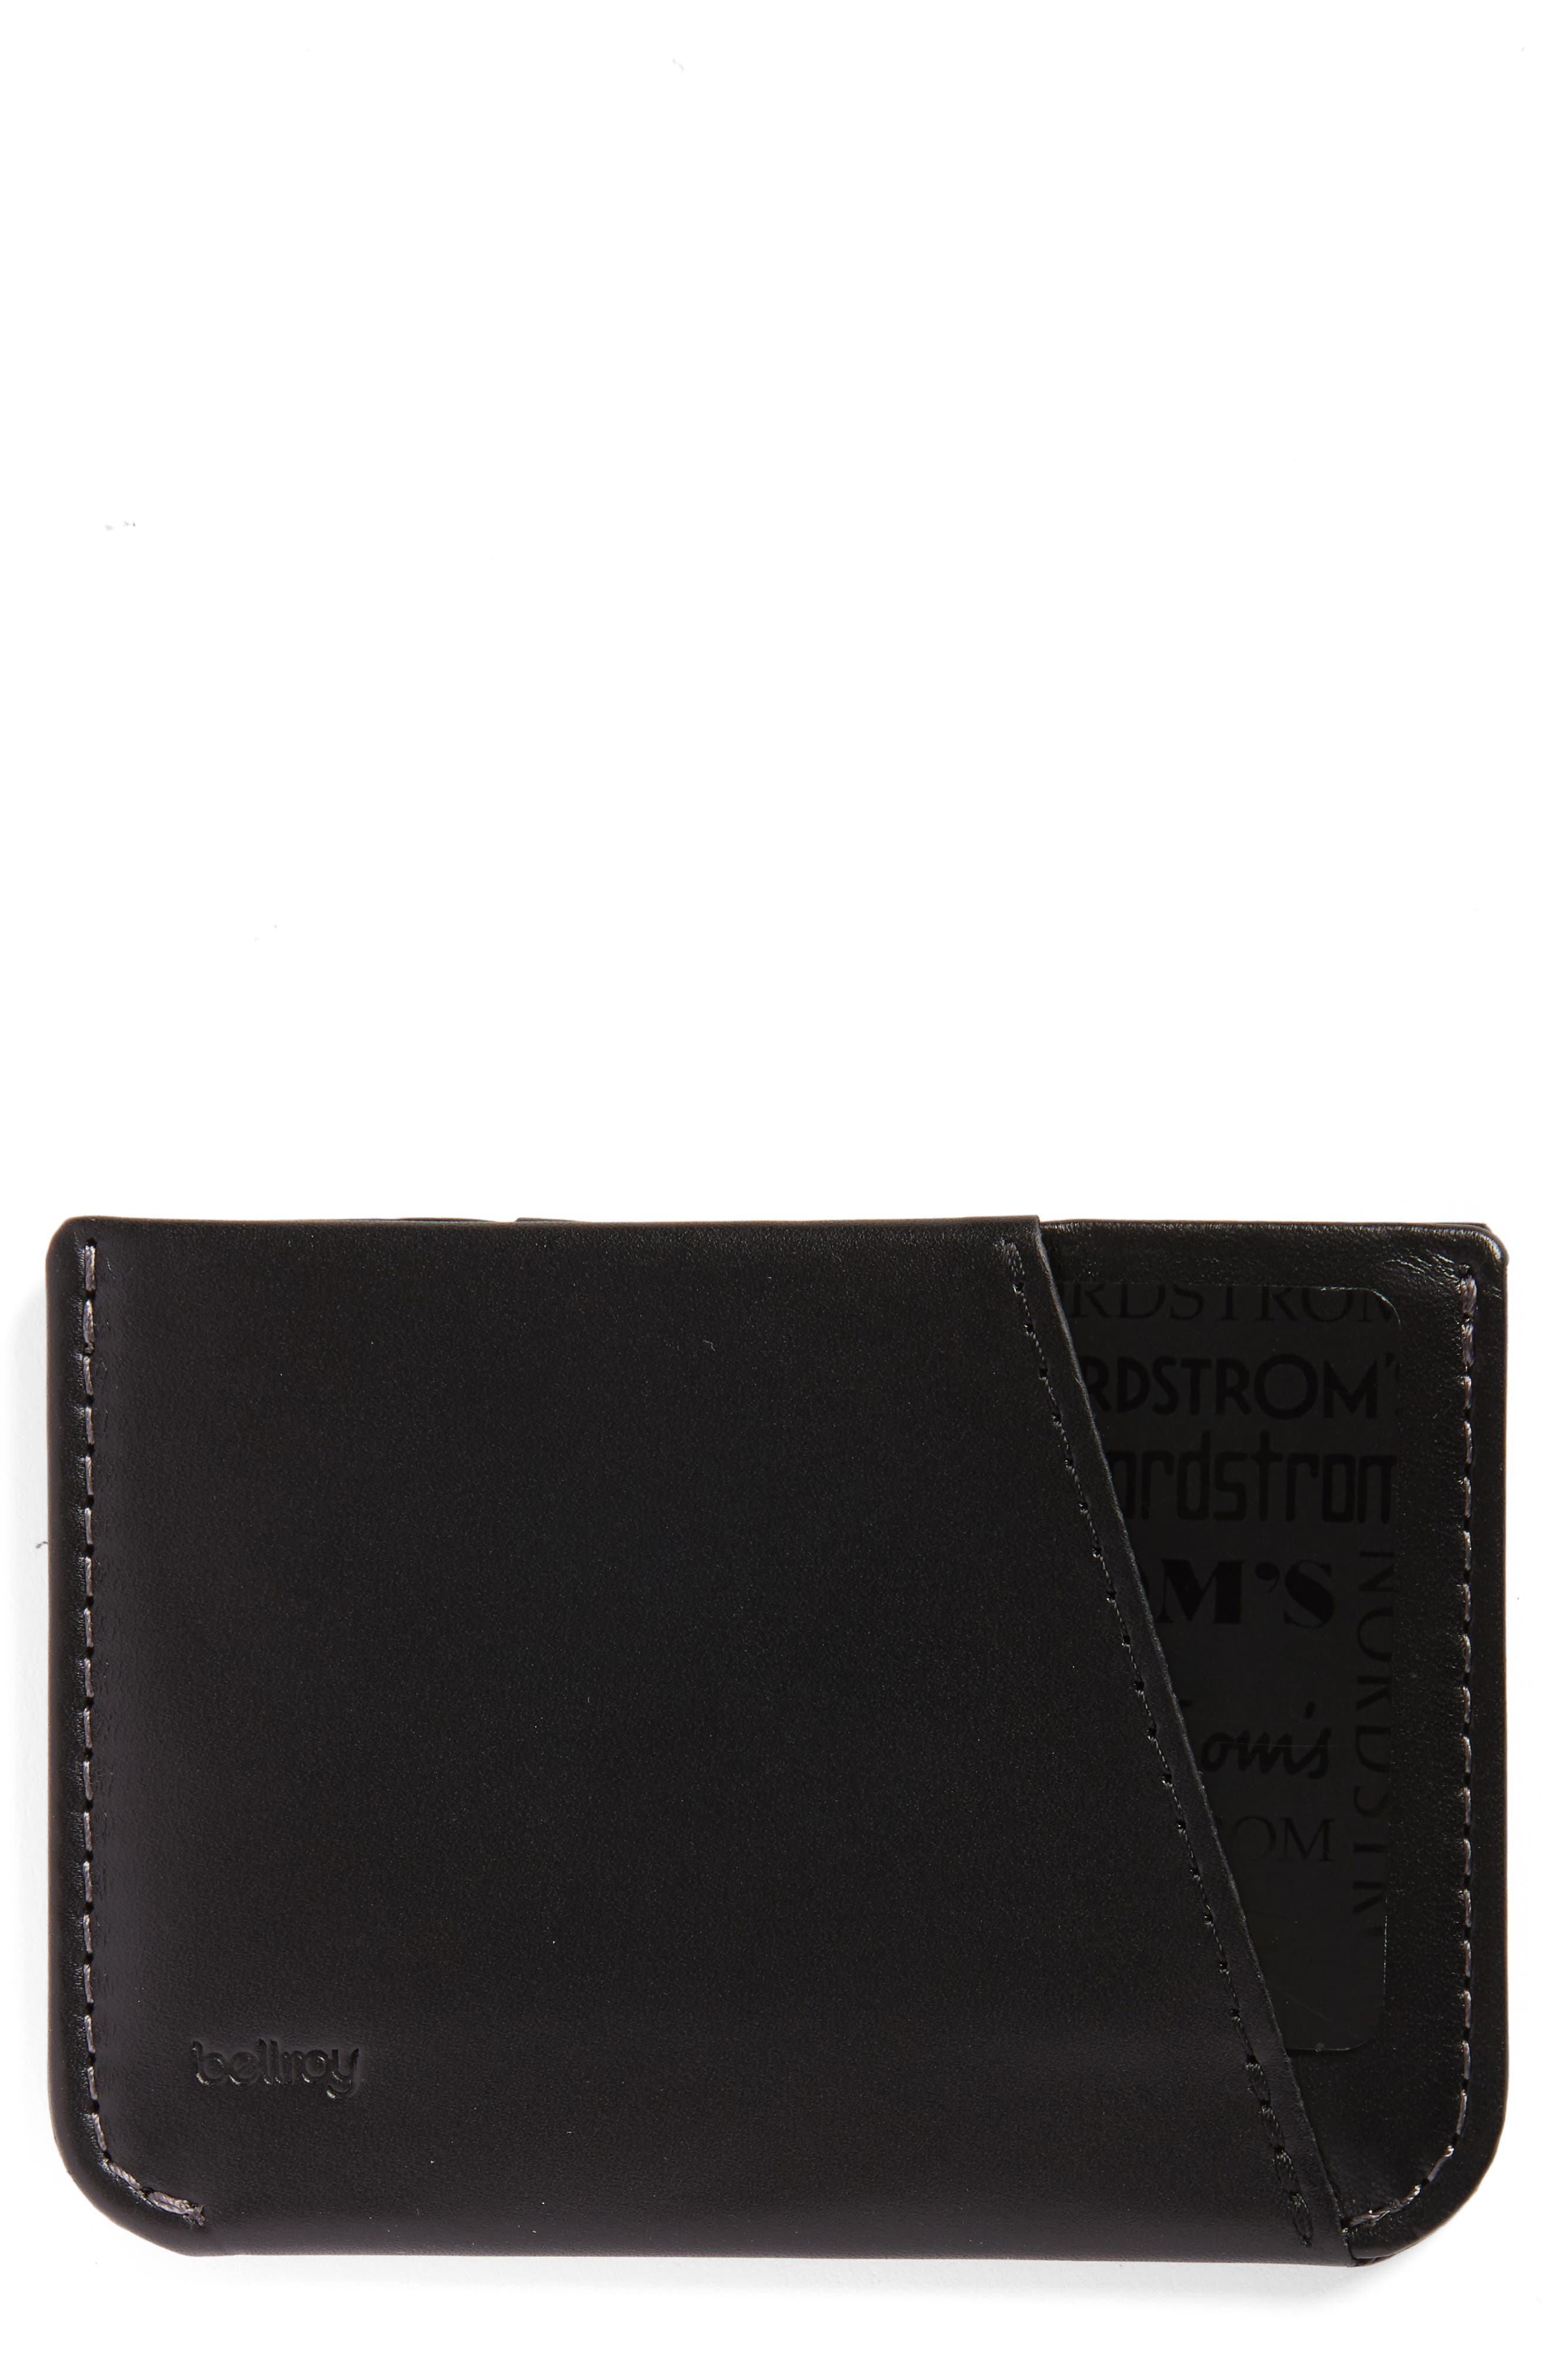 Main Image - Bellroy Micro Sleeve Card Case